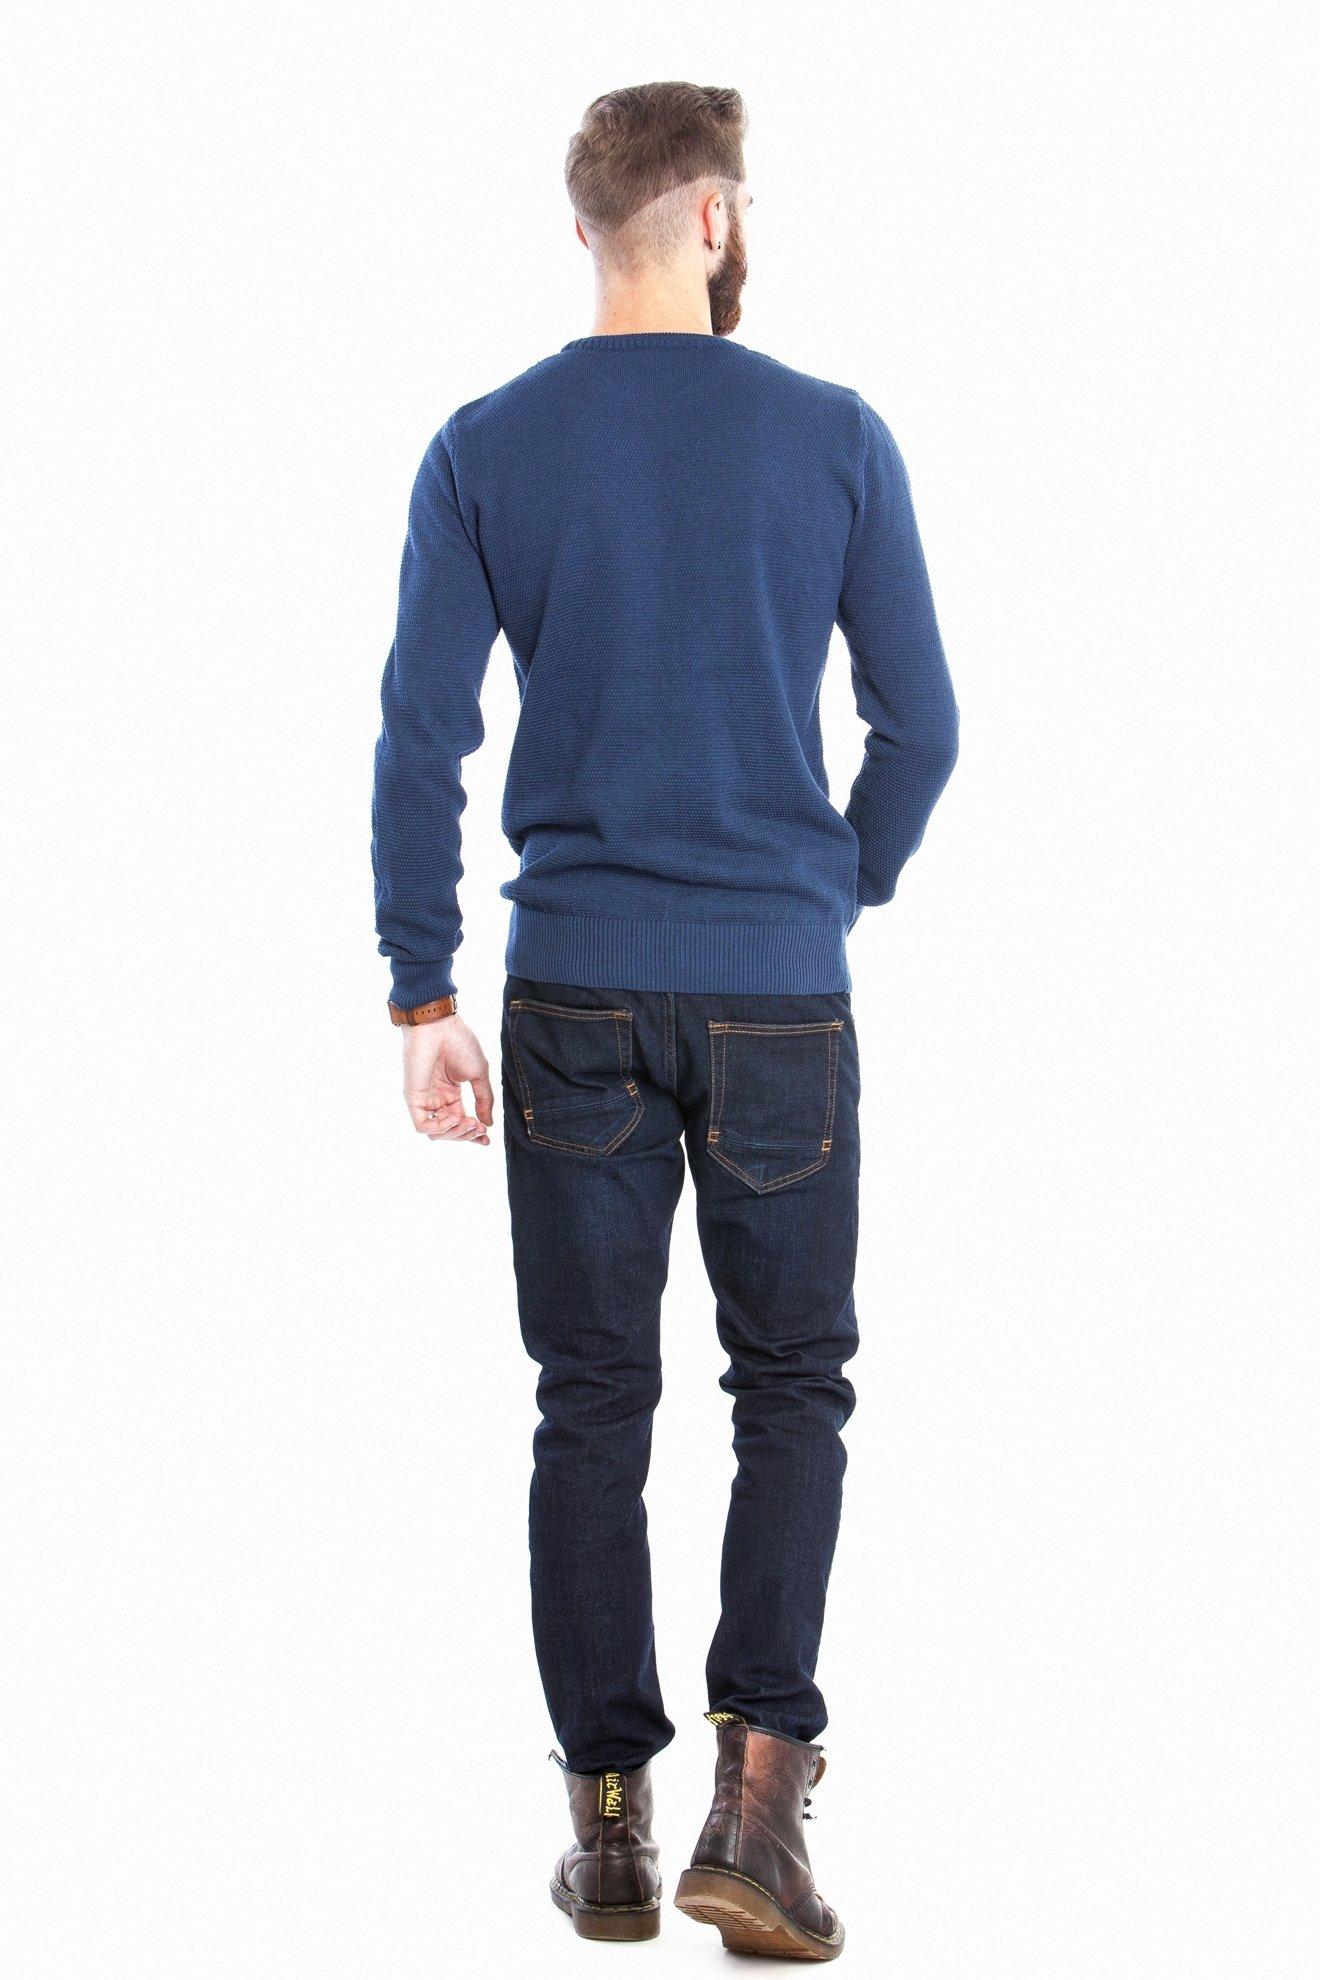 Мужской синий свитер (Арт. POS 2670)